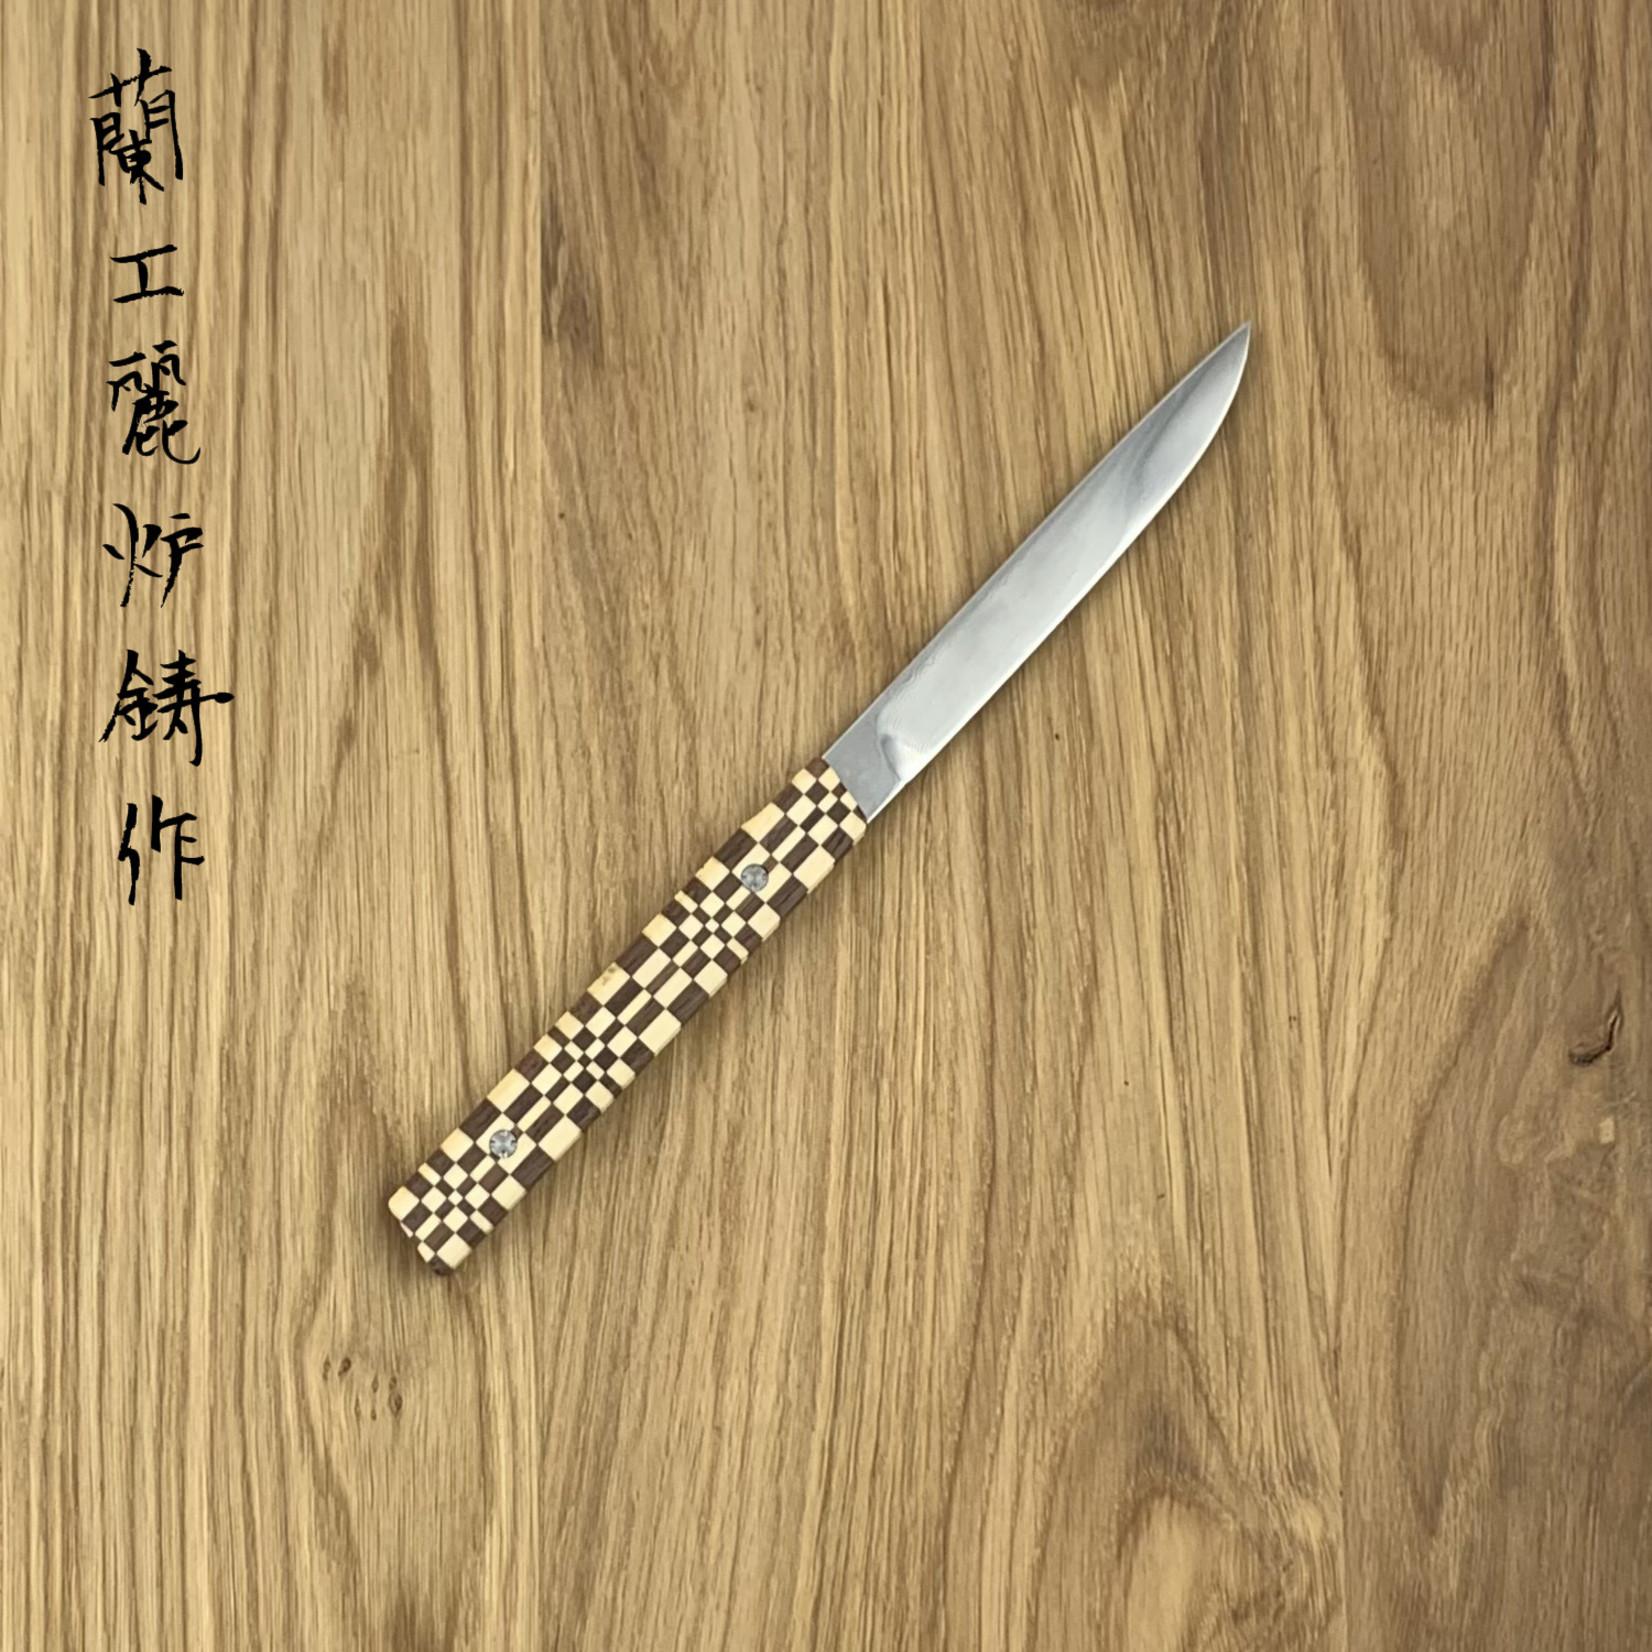 RYUSEN Steak knife SK04 Yosegi